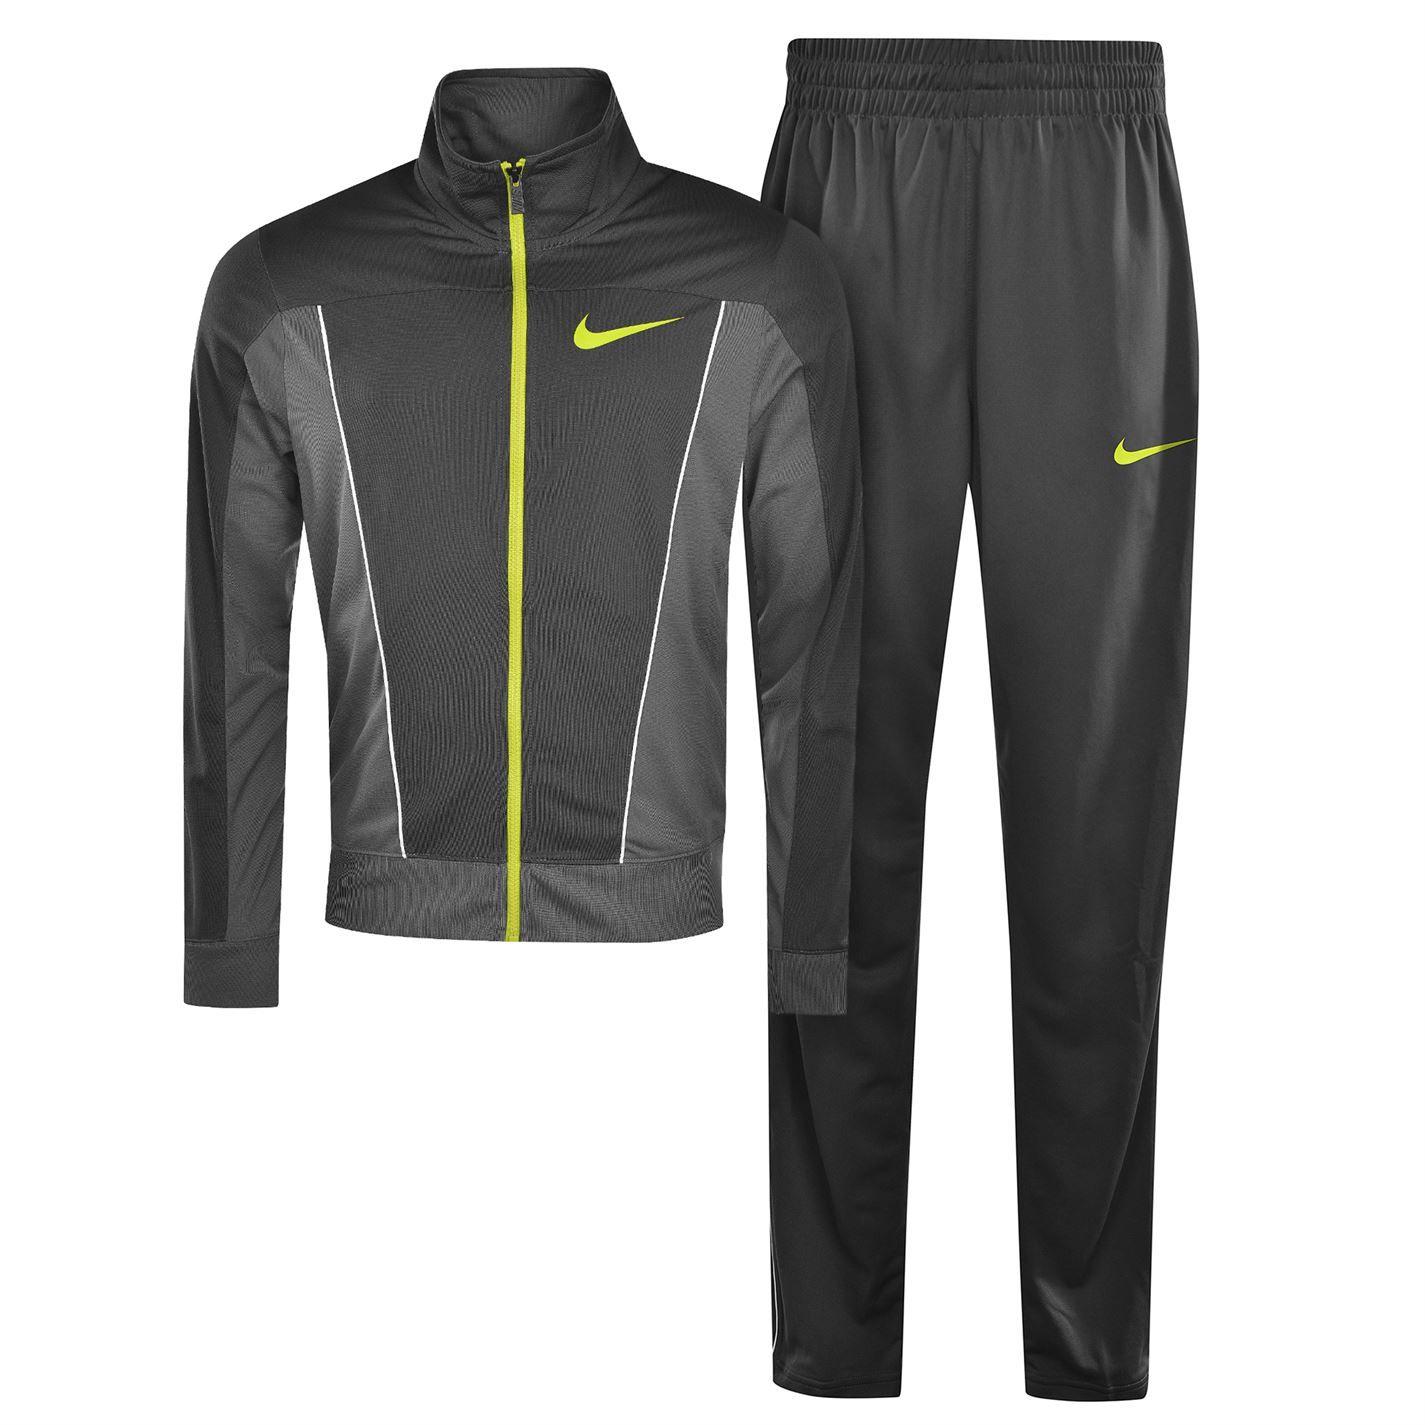 Armani Mens Sport Coats Image Men's Fashion Gray